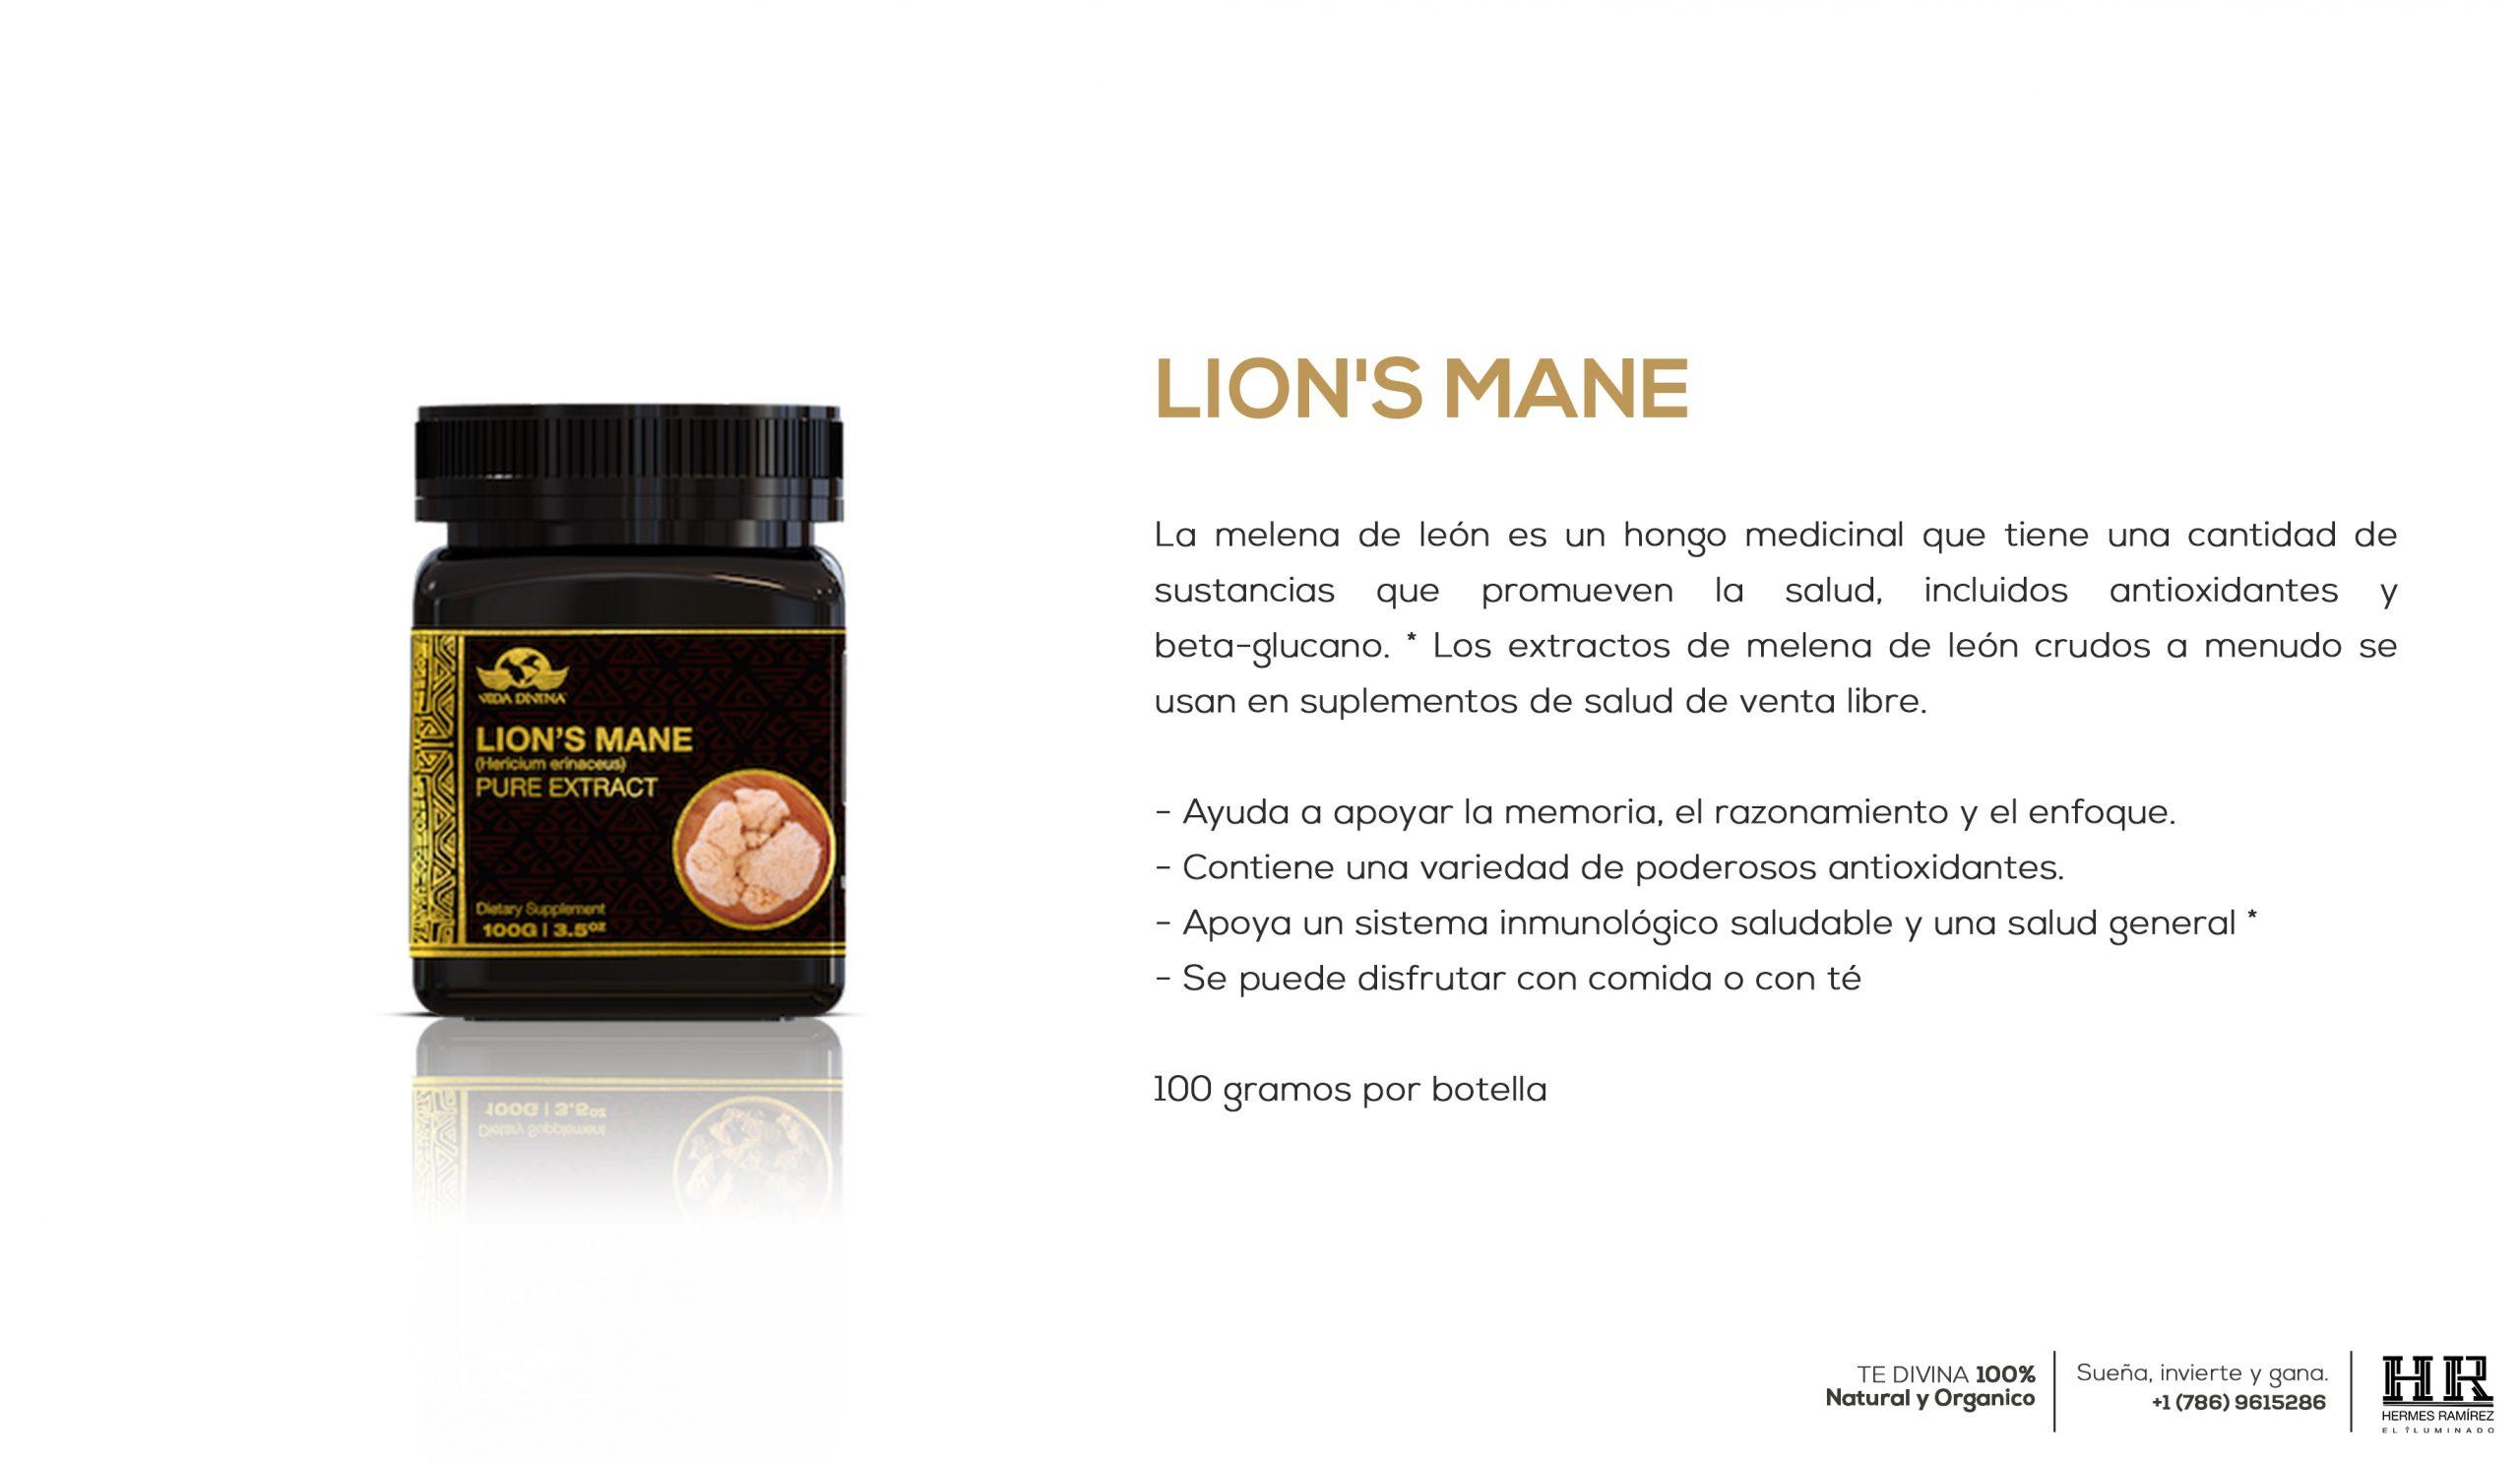 POST extracto lions info